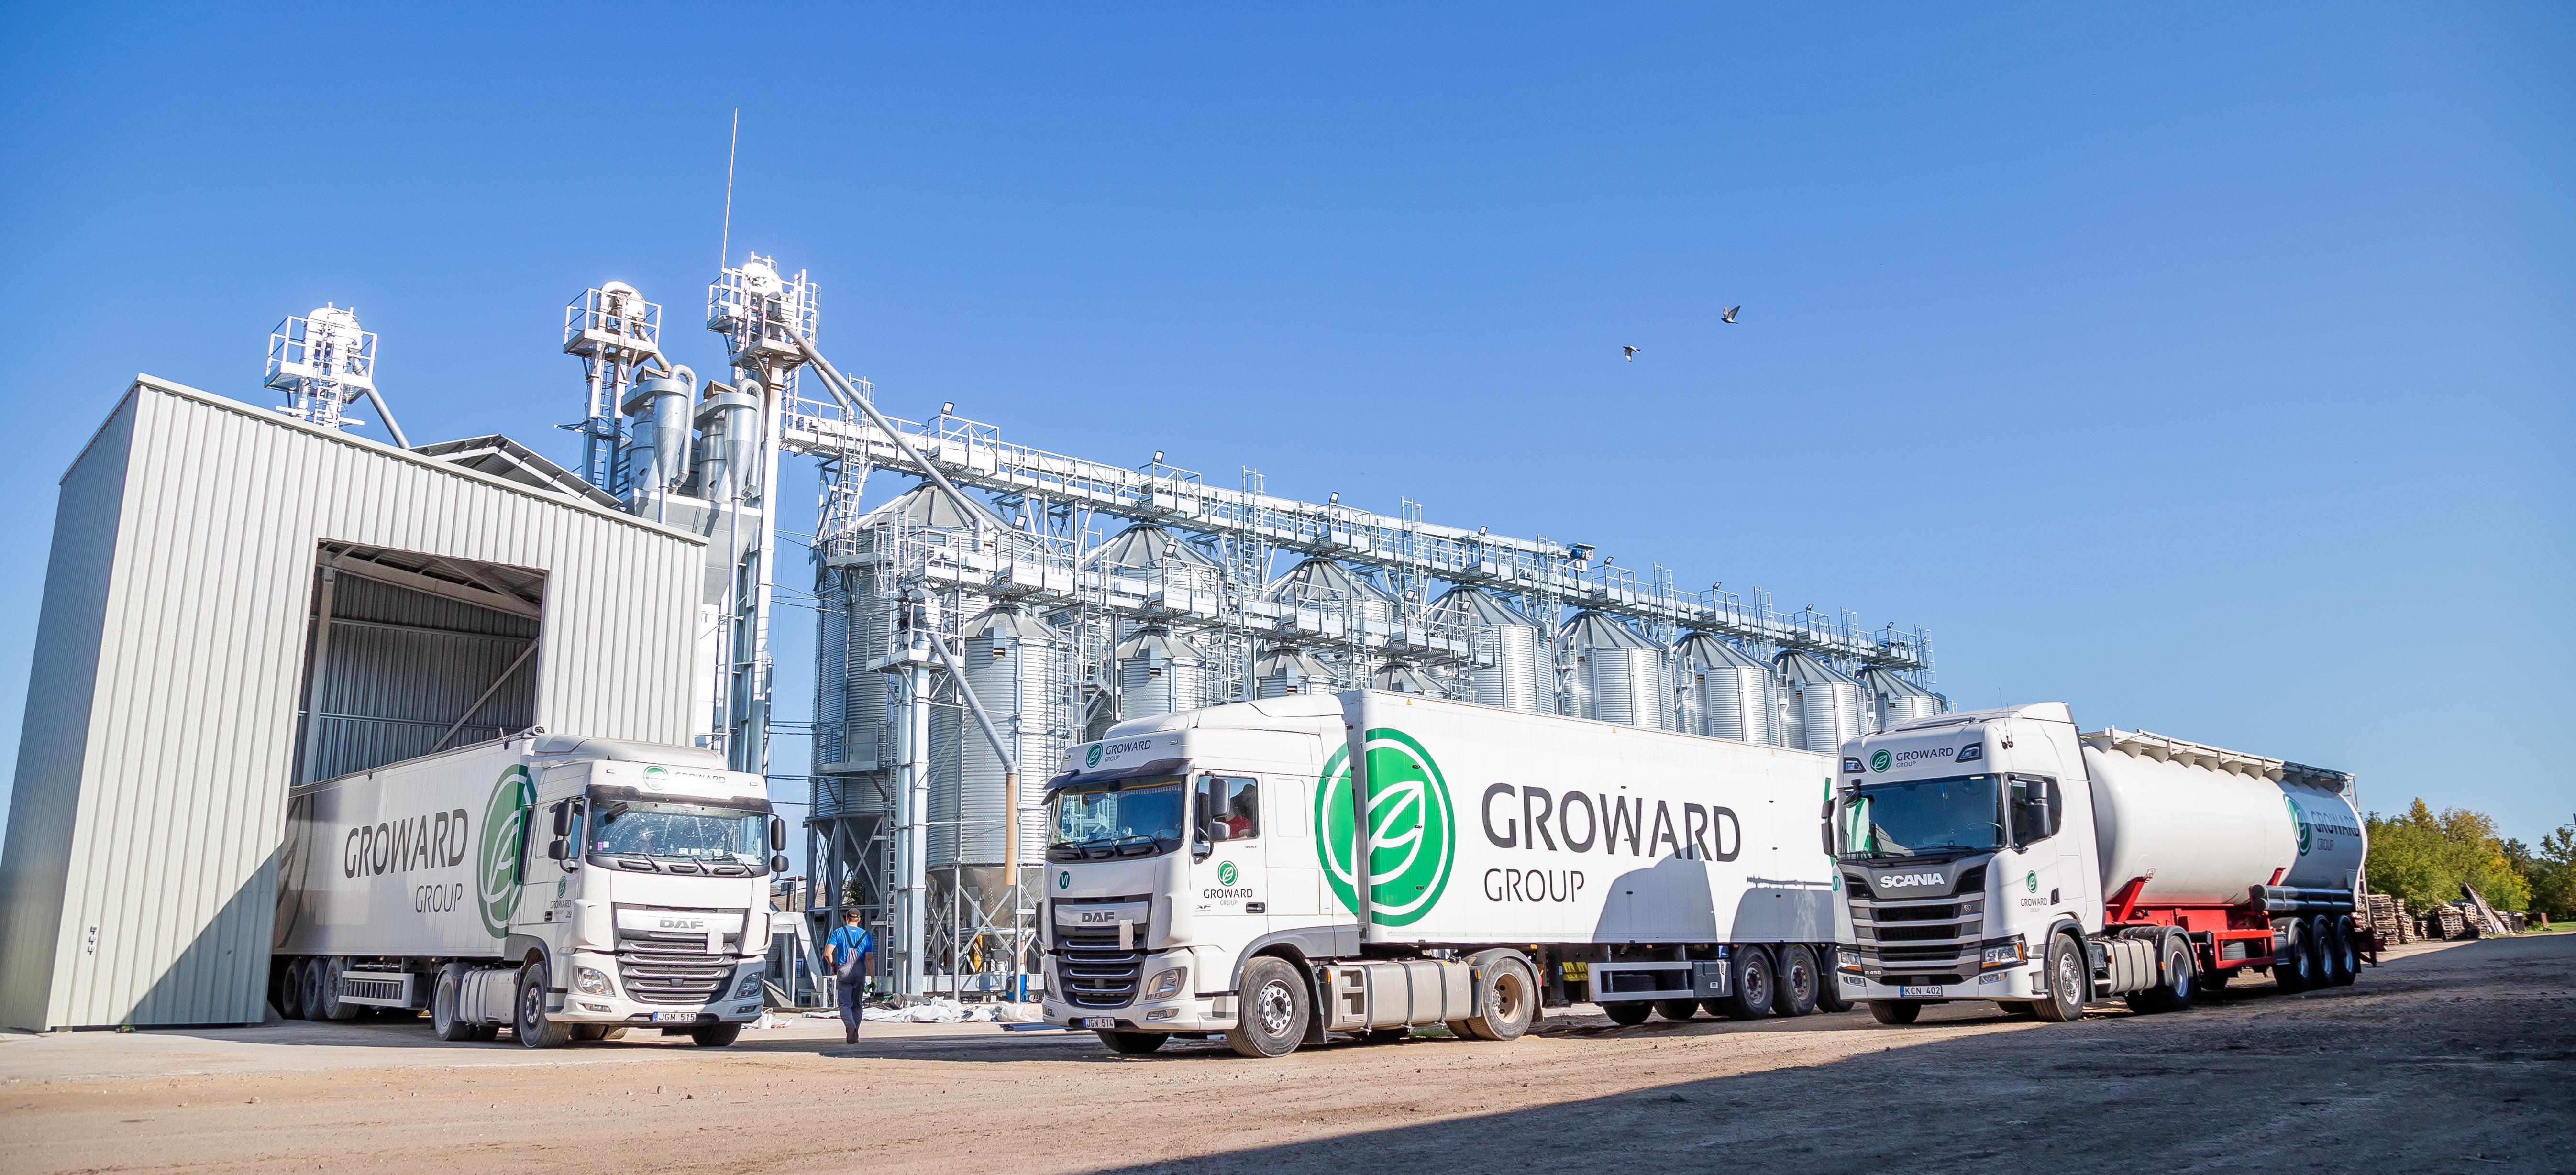 Transport - Groward group